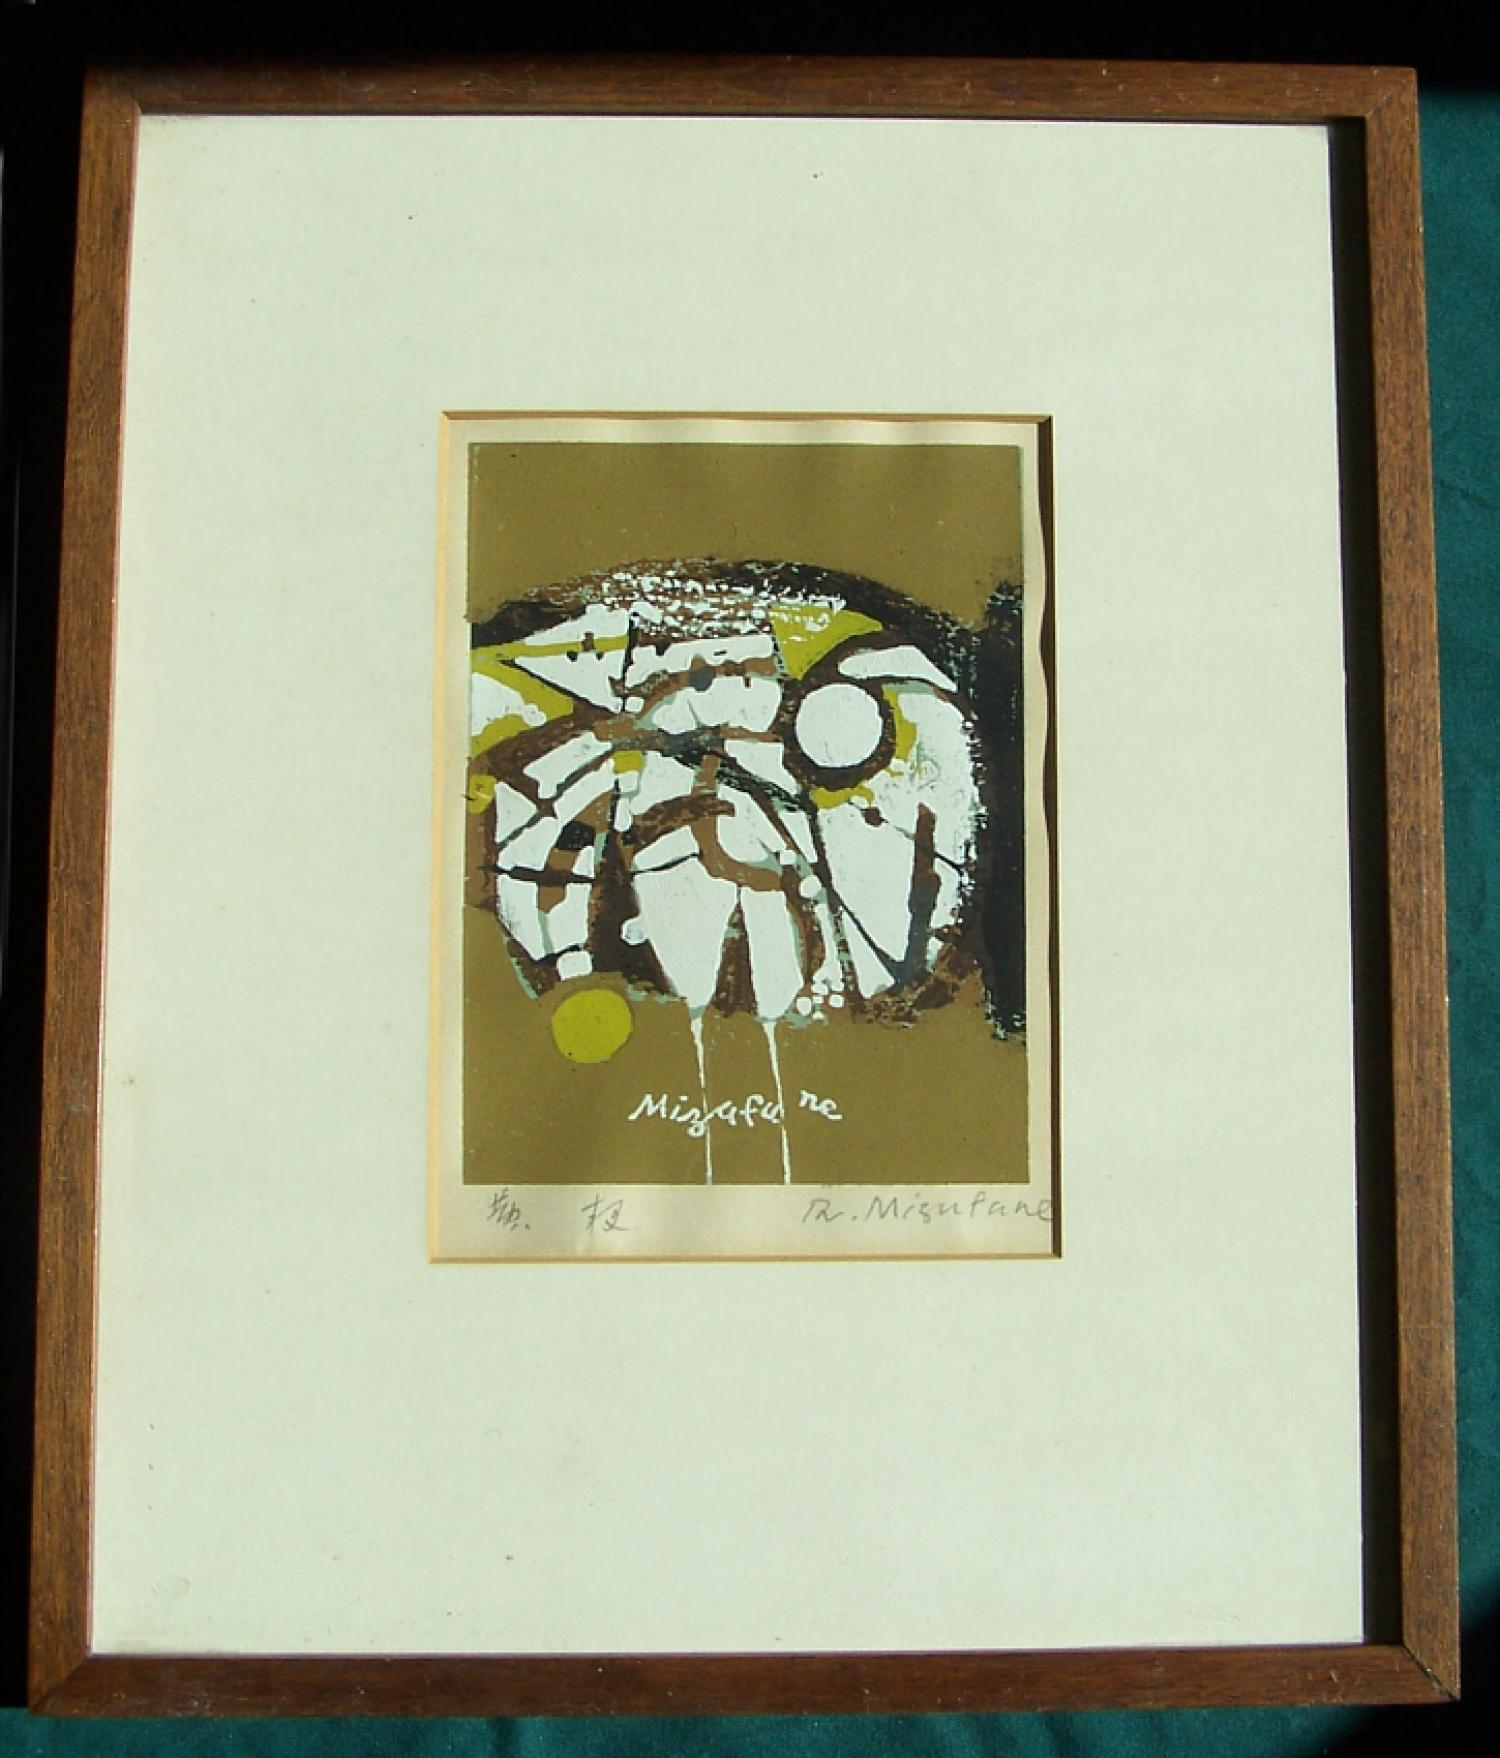 Mizufune Rokushu colored wood block print c1960